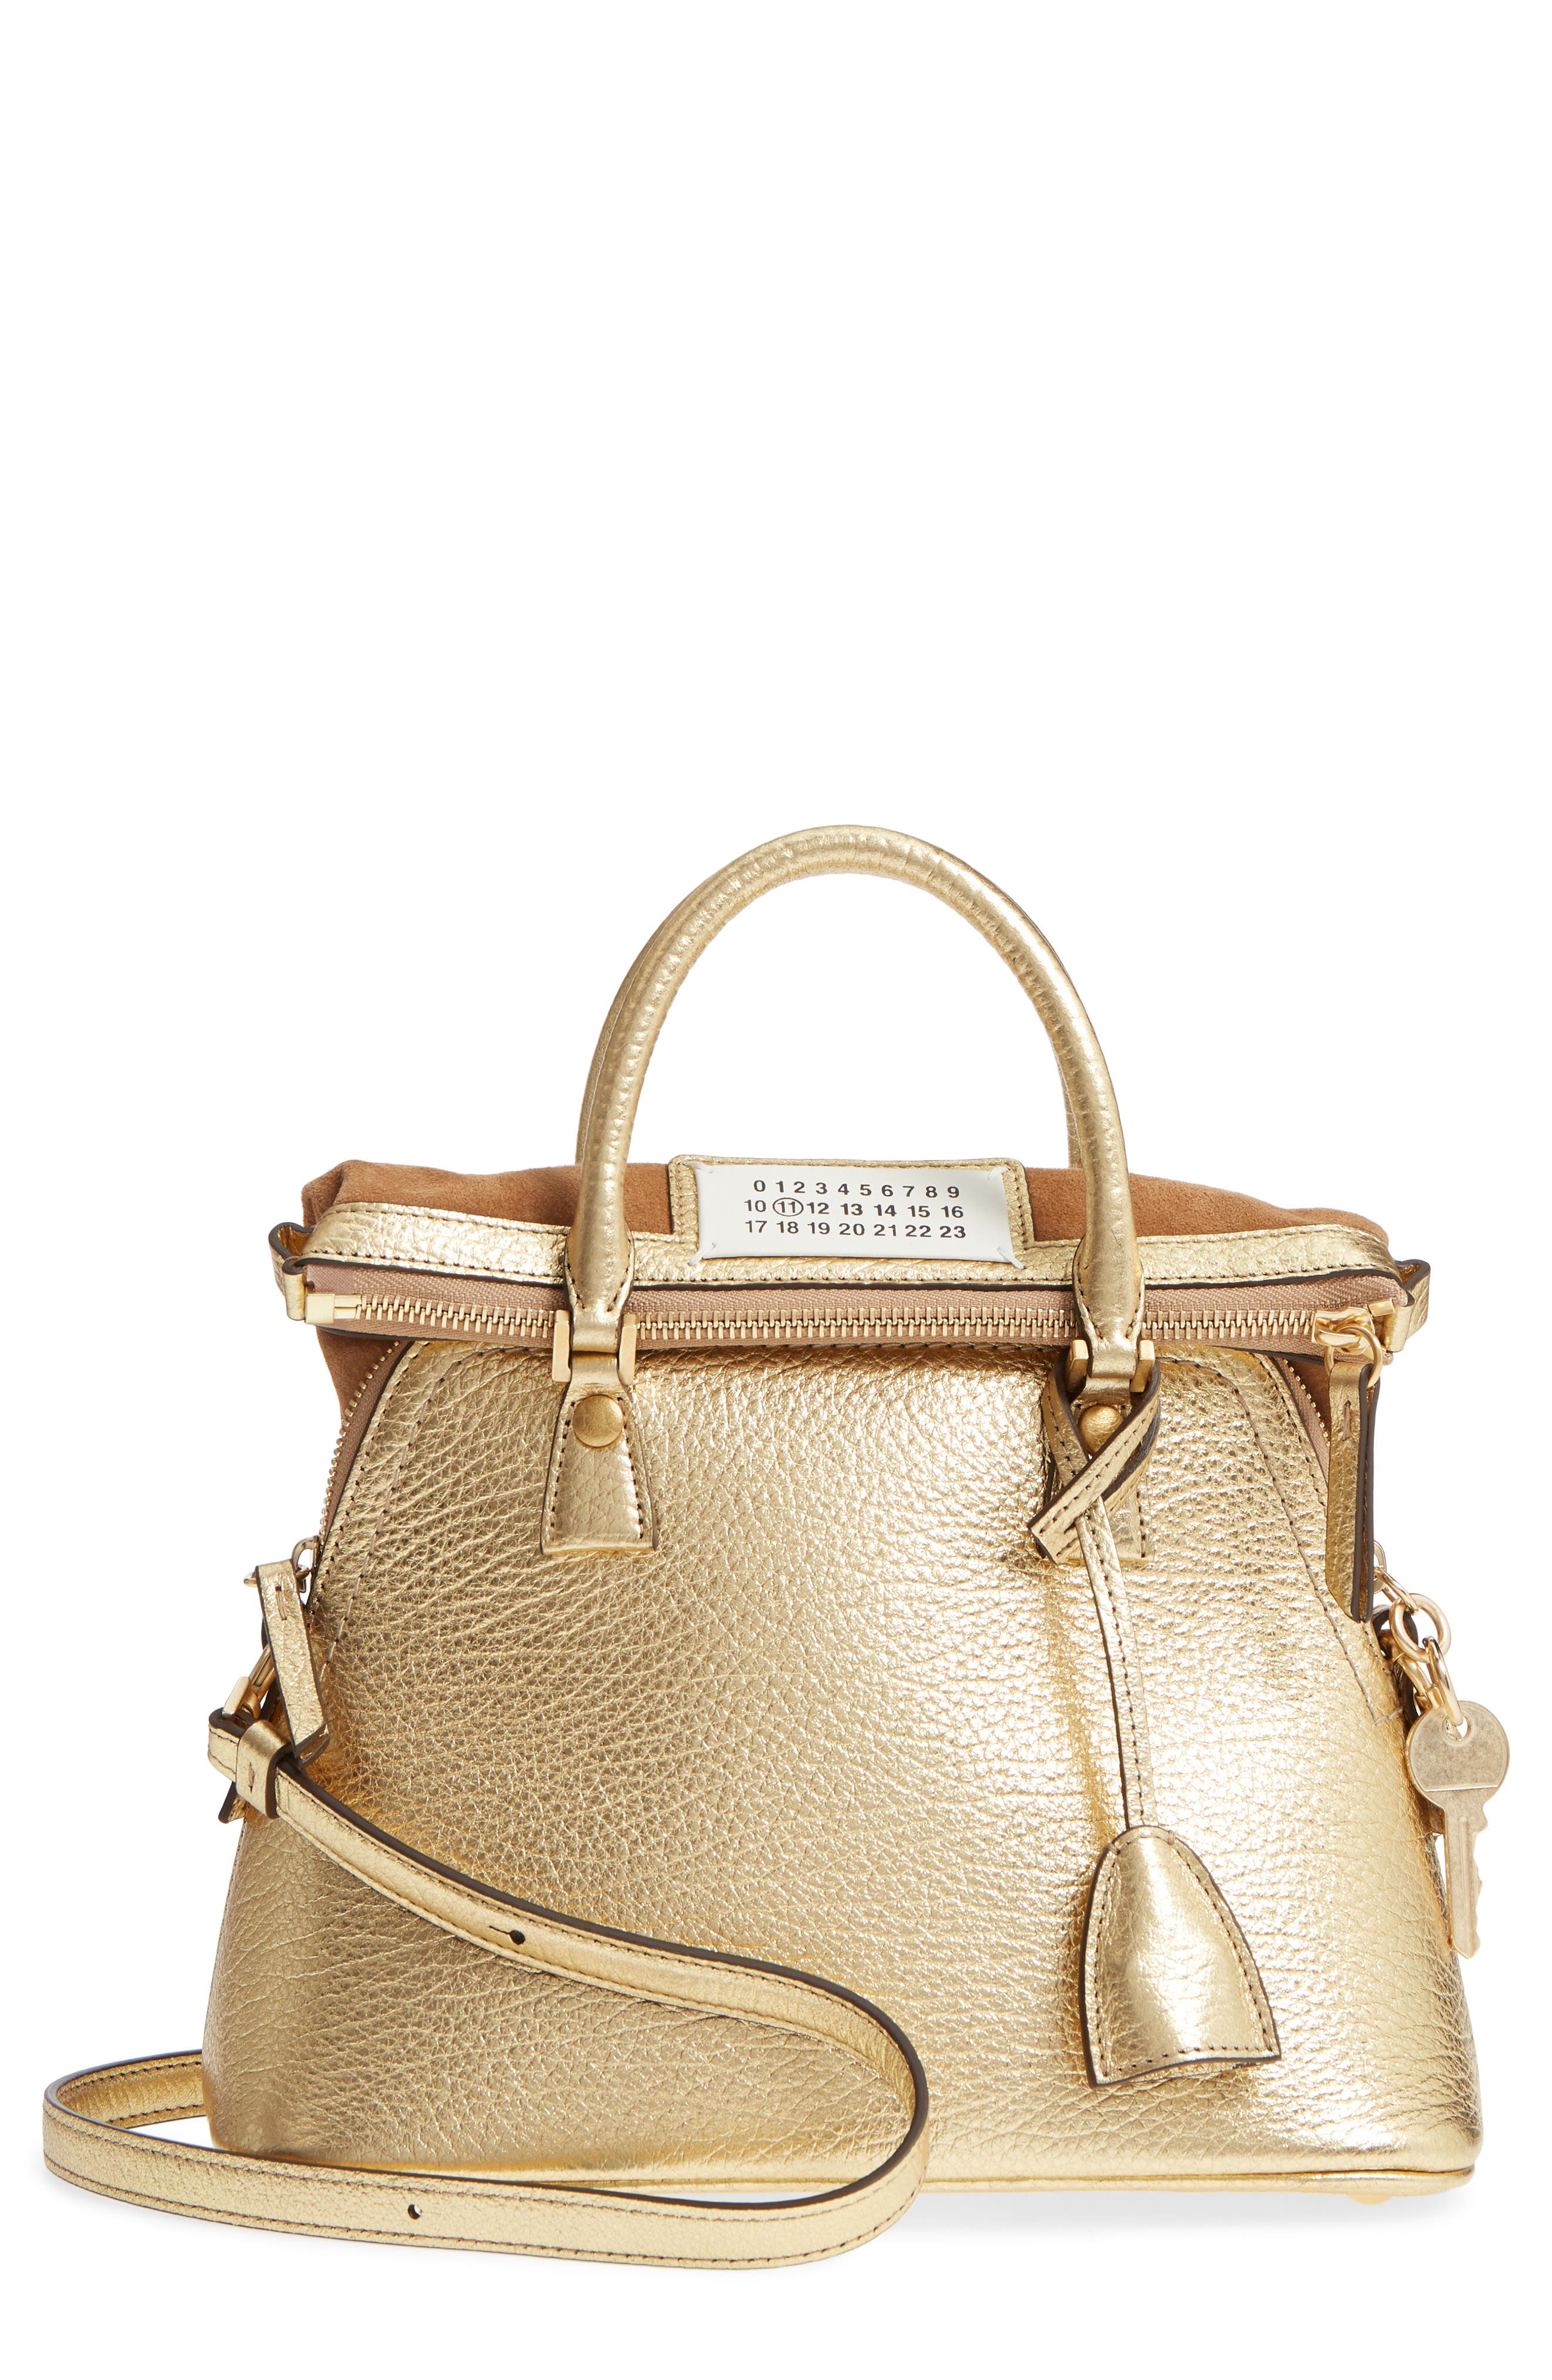 Small 5AC Calfskin Leather Handbag,                             Main thumbnail 1, color,                             Gold